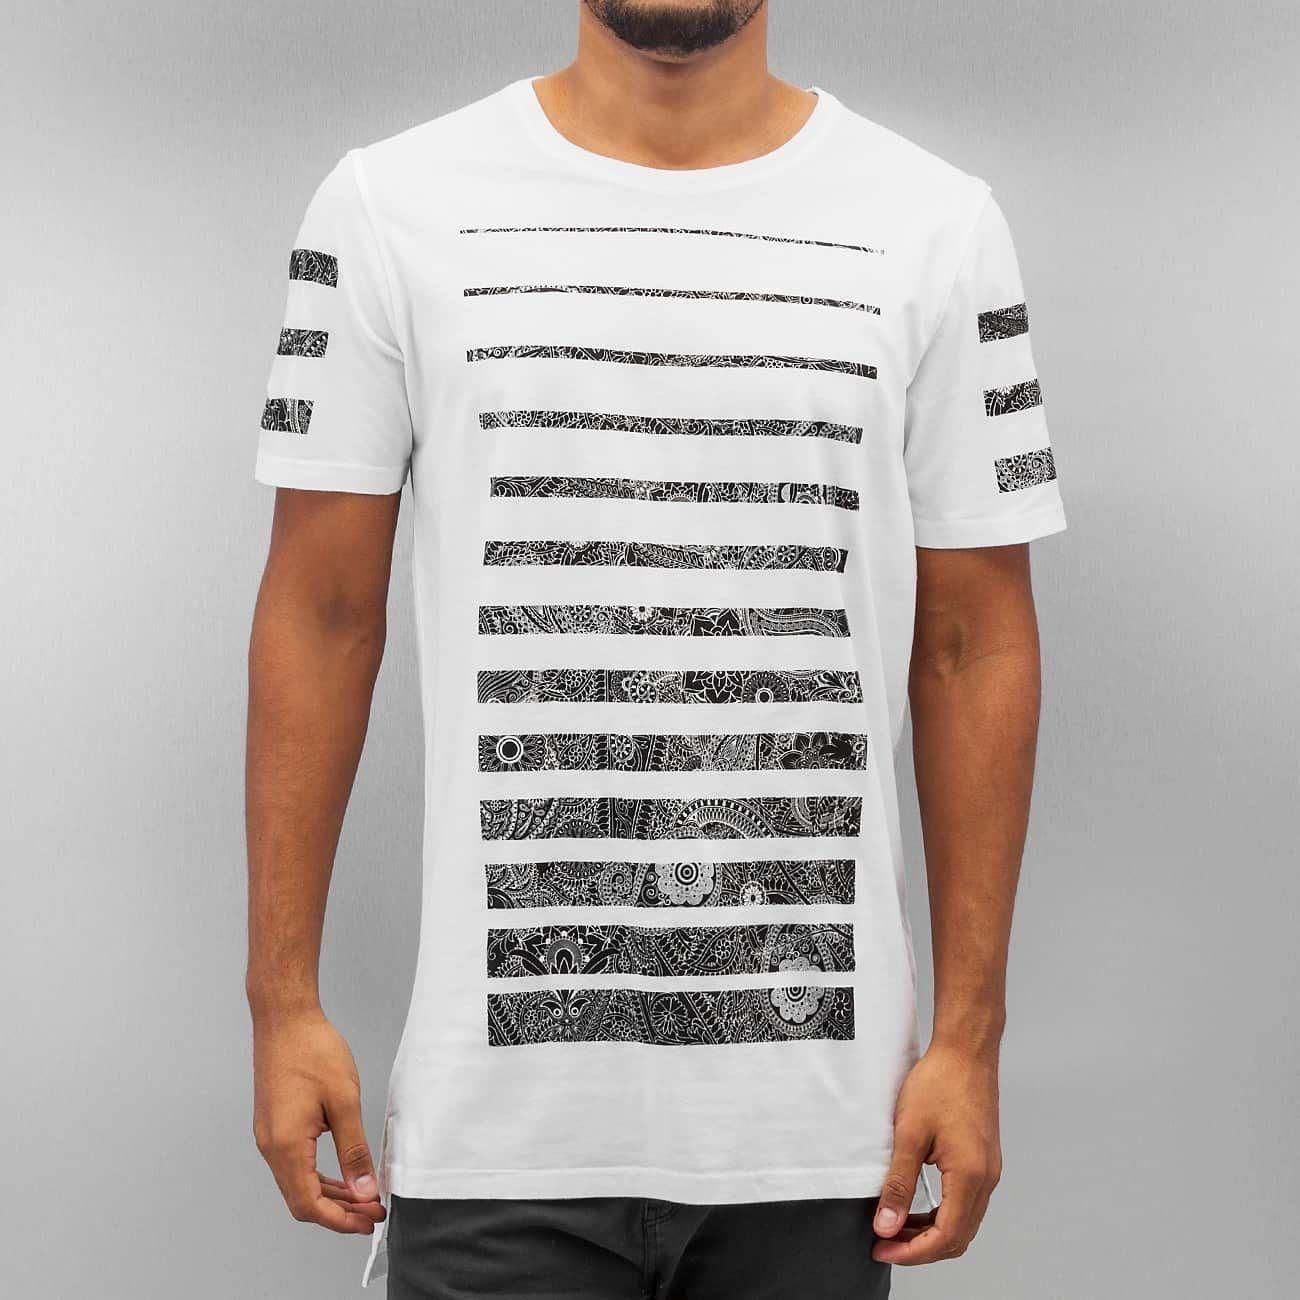 https://www.def-shop.com/black-kaviar-garford-t-shirt-white.html